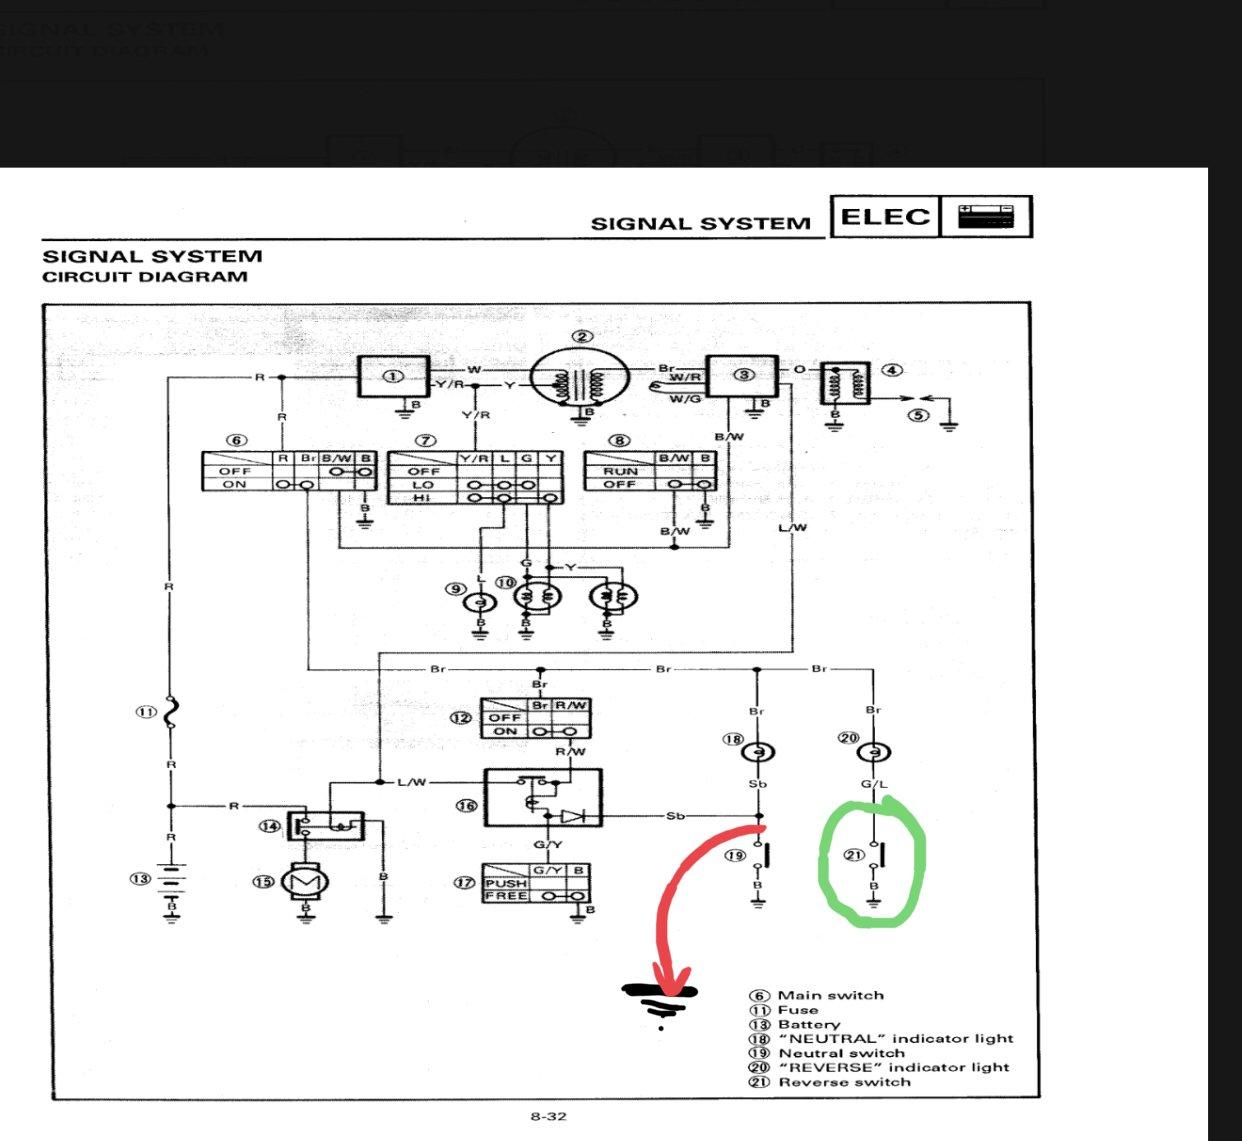 1994 Yamaha Timberwolf Wiring Diagram